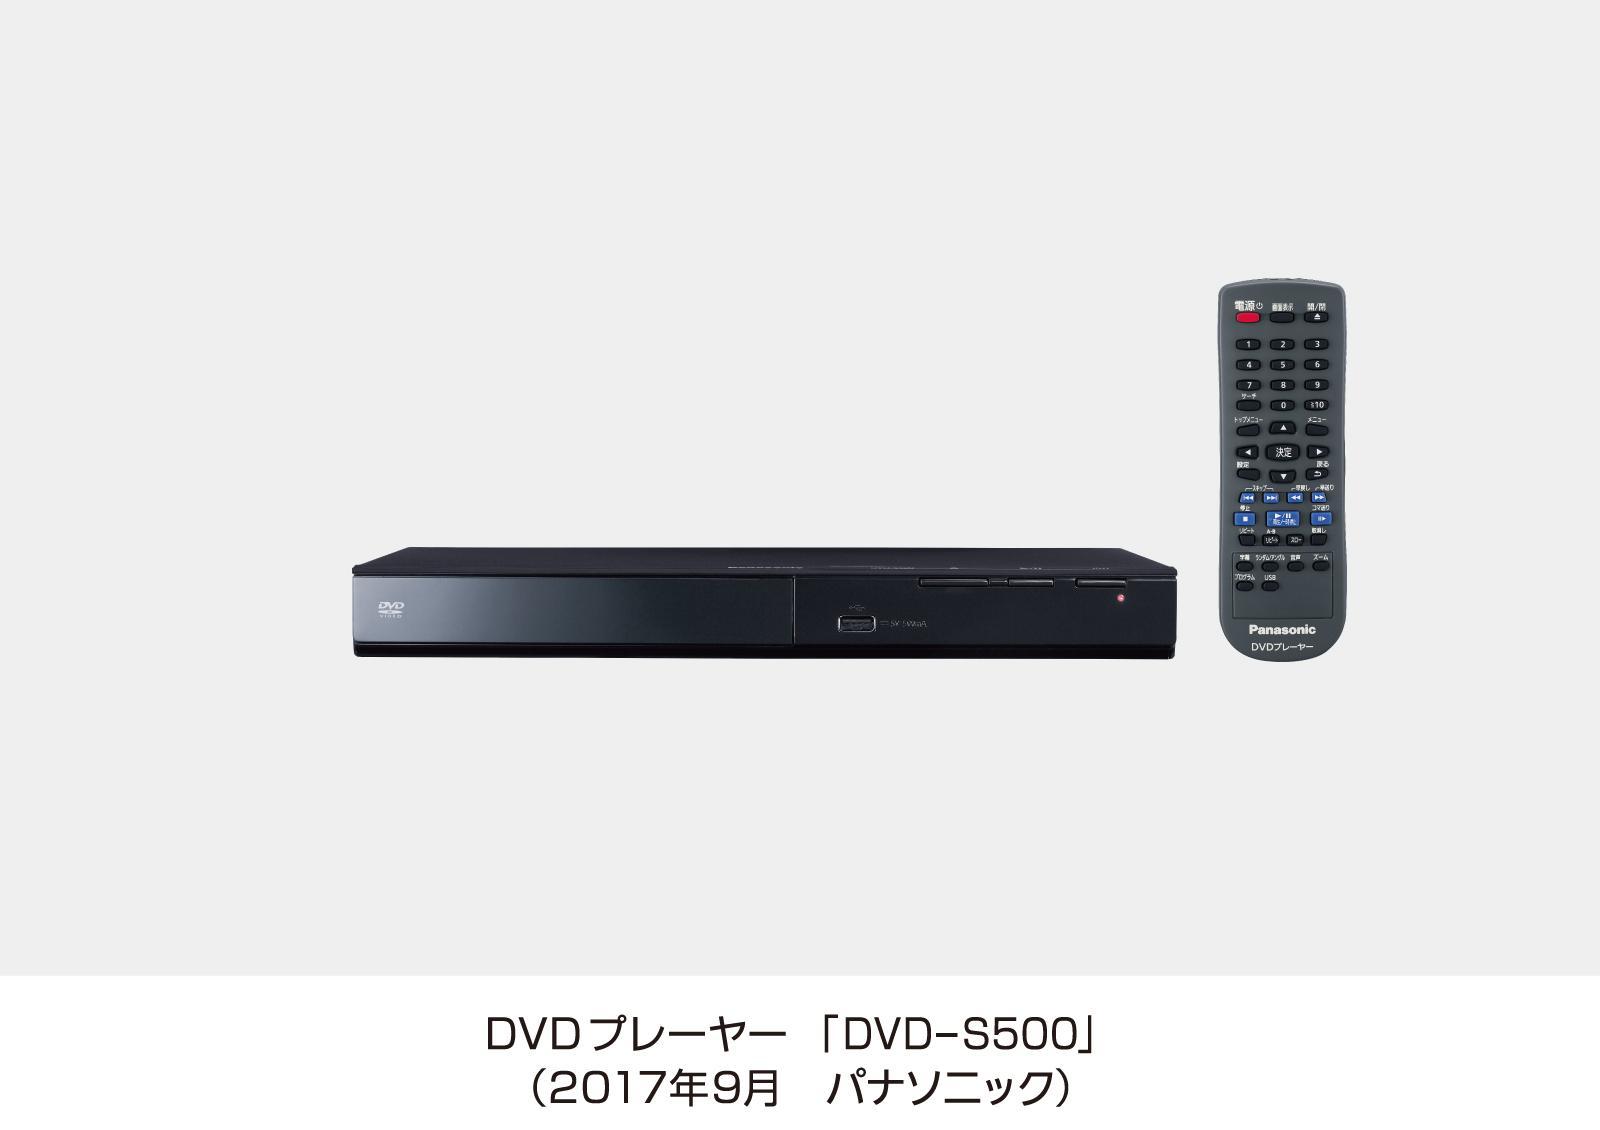 DVDプレーヤー DVD-S500を発売